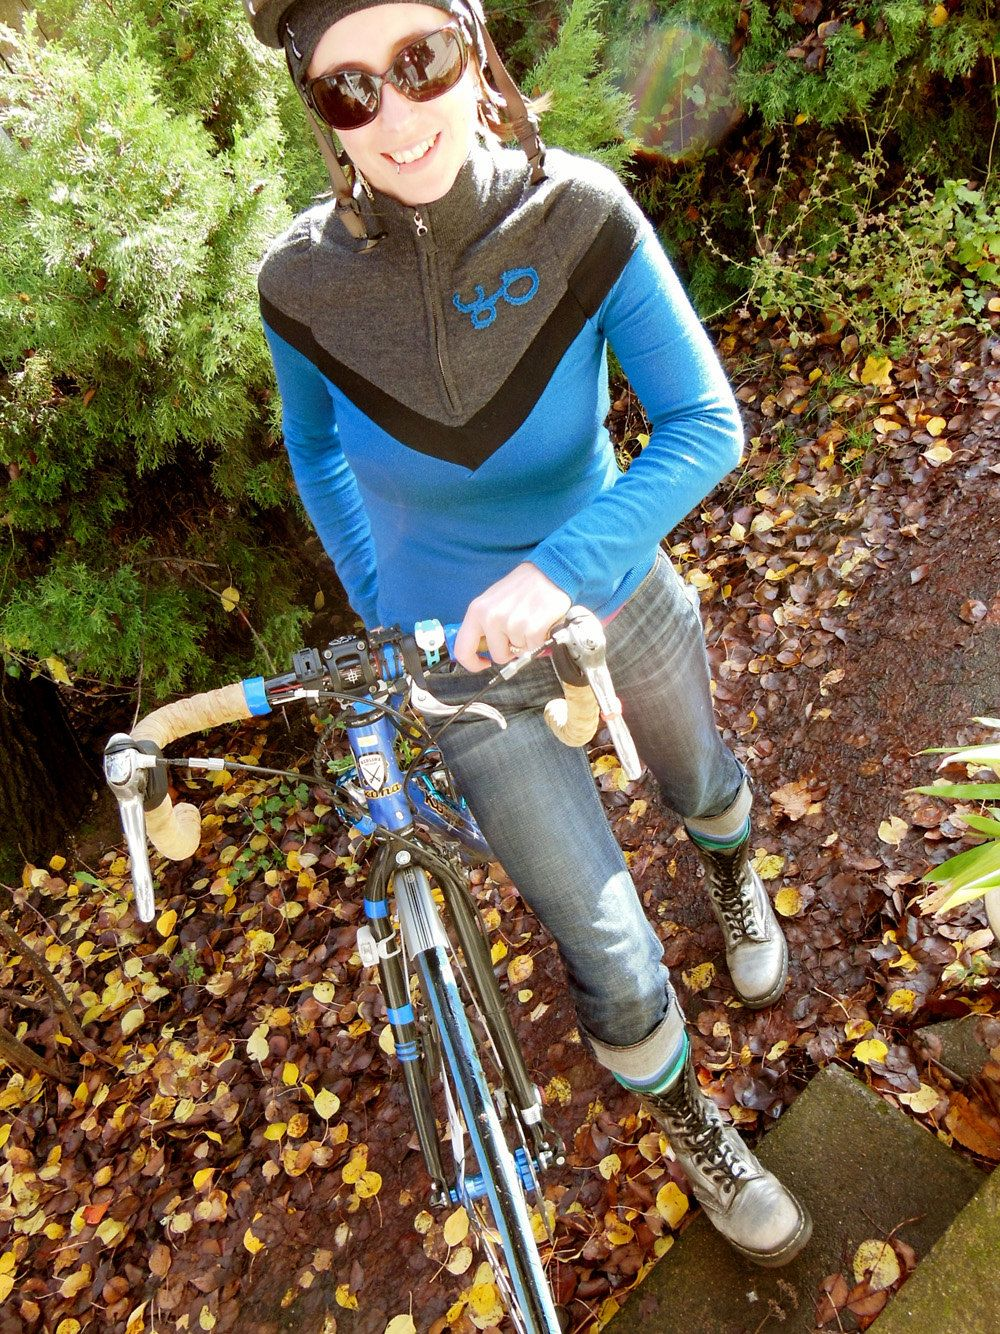 Cycling shirt design your own - Design Your Own Womens Chevron Long Sleeve Merino Wool Jersey 135 00